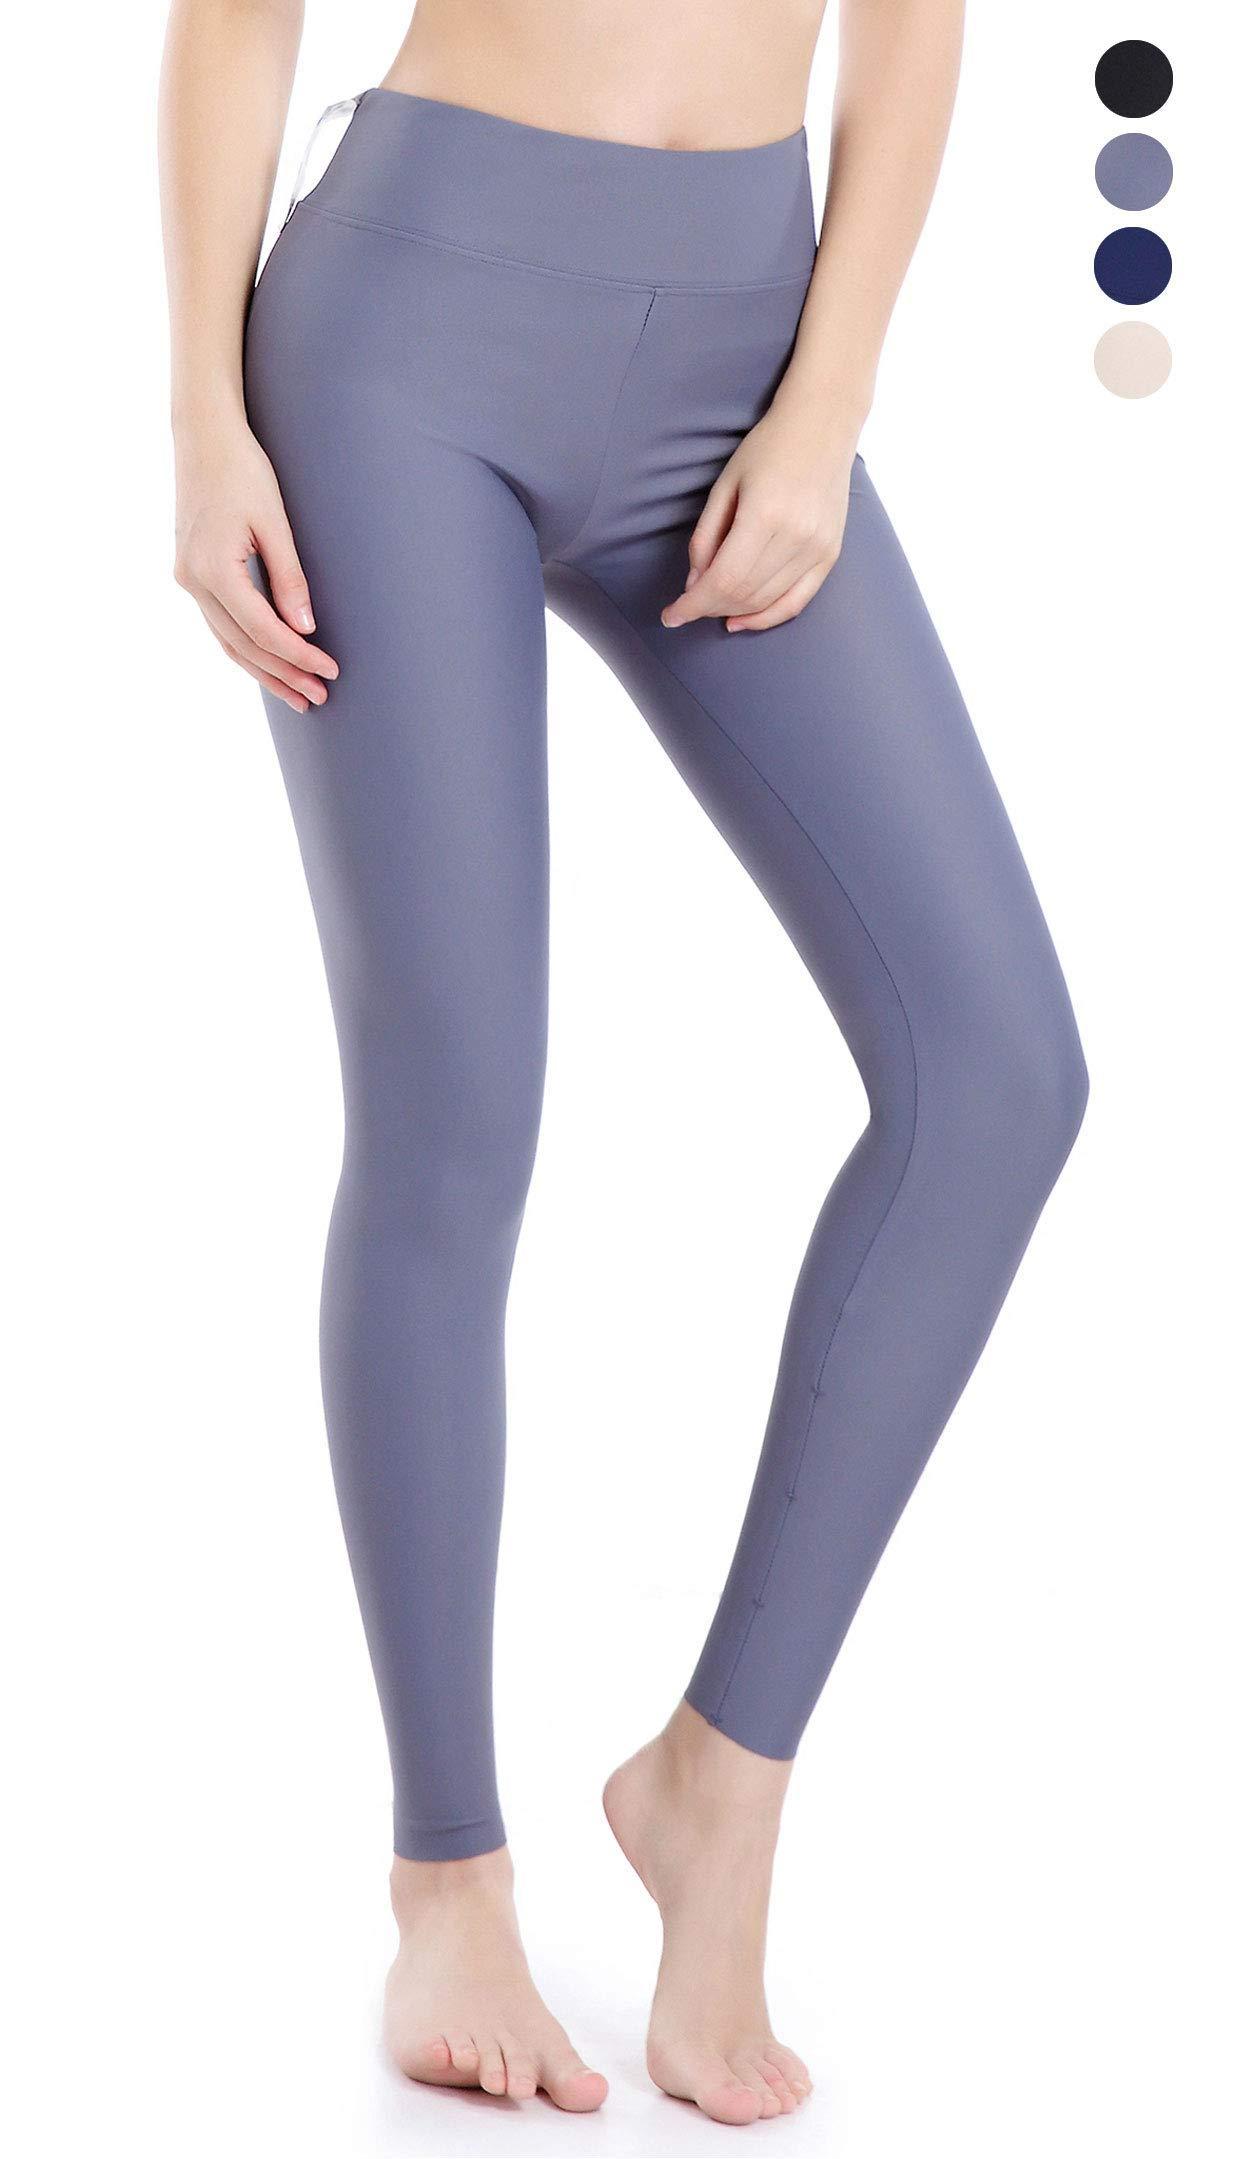 Sunzel Yoga Pants for Women Mid&High Waist Tummy Control Workout Leggings …